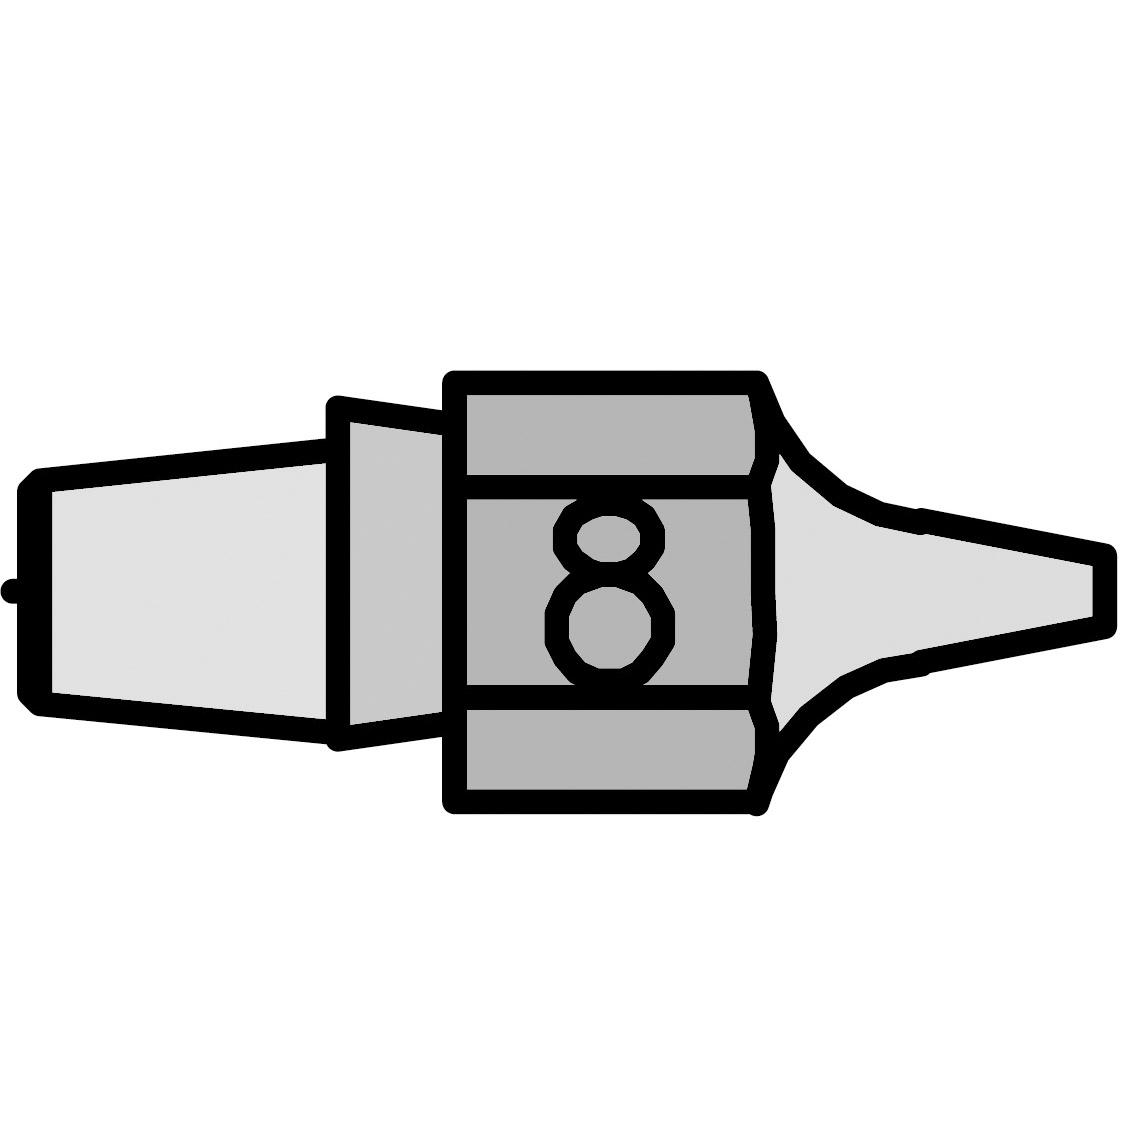 DX 118 Desoldering Nozzle